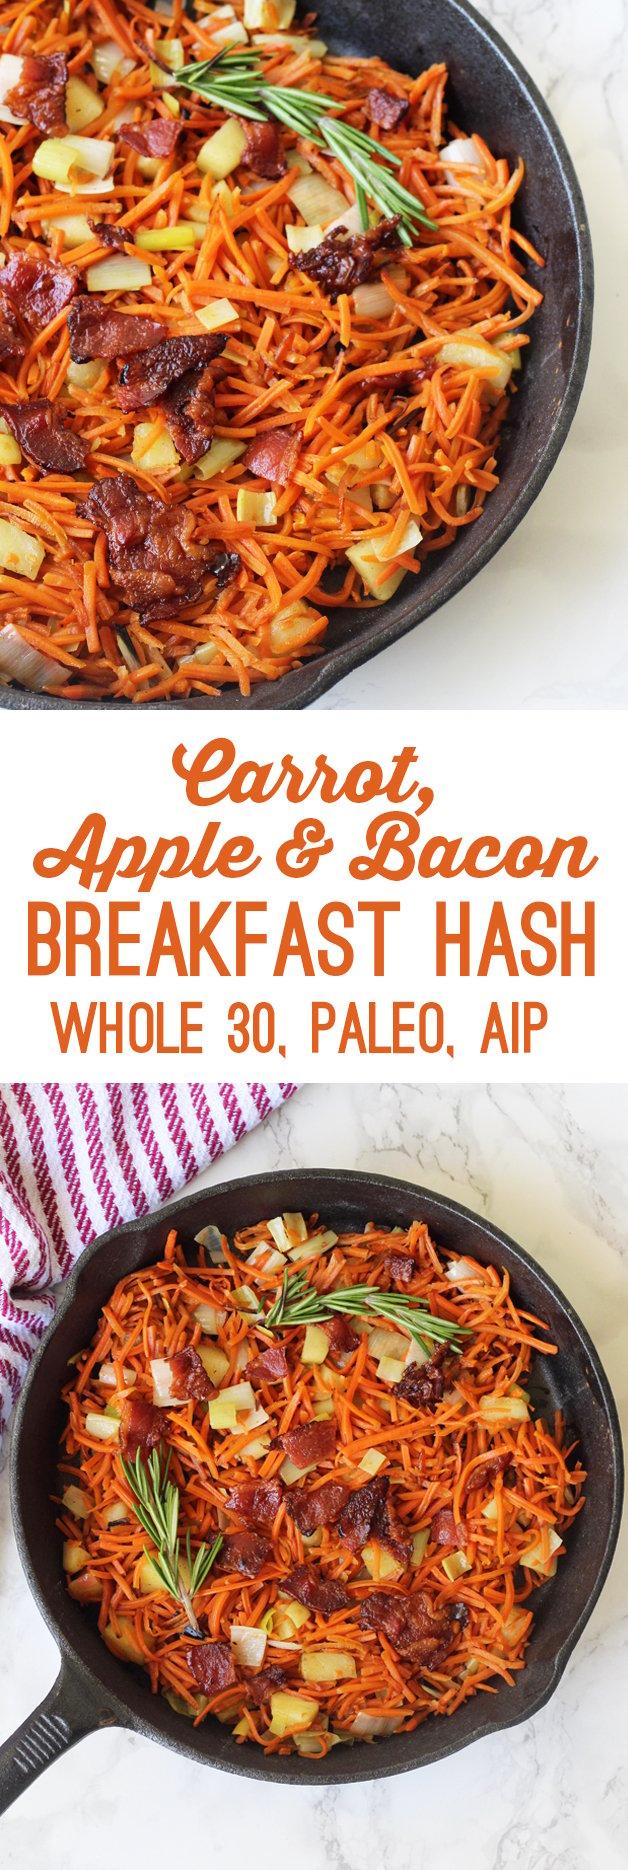 Carrot Apple Bacon Breakfast Hash (Whole 30, Paleo, AIP)